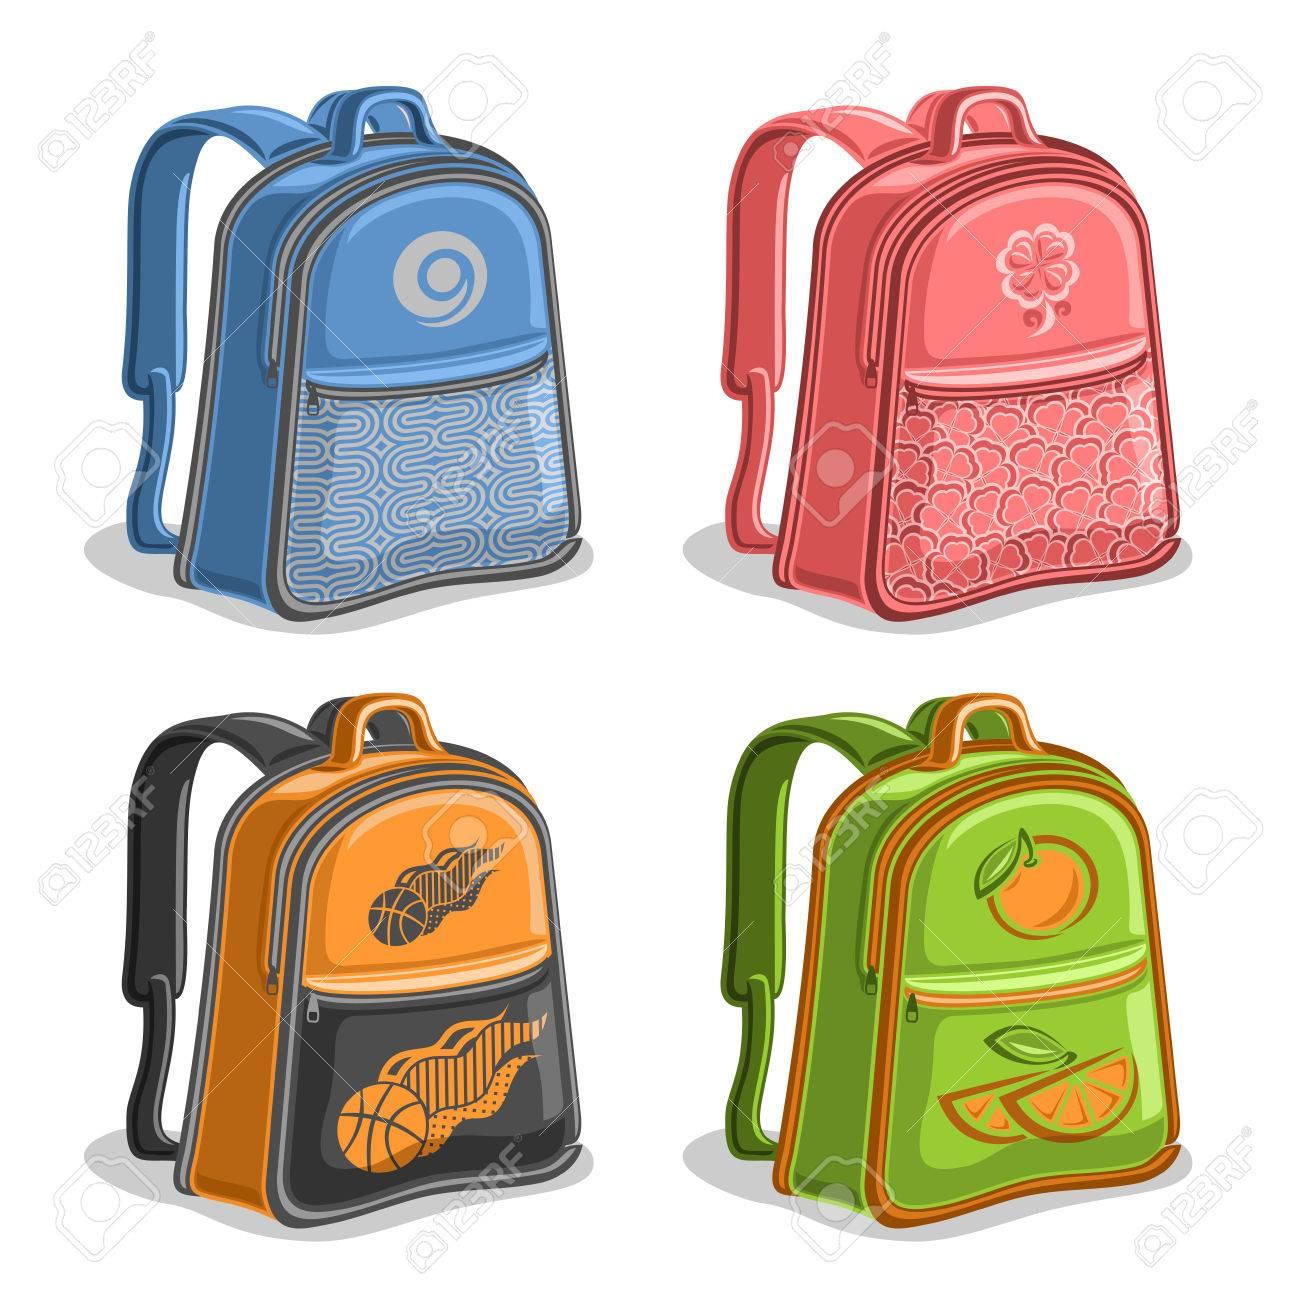 Colores Niños Conjunto Para Vectores De Mochilas Bolsa Onn6qFE